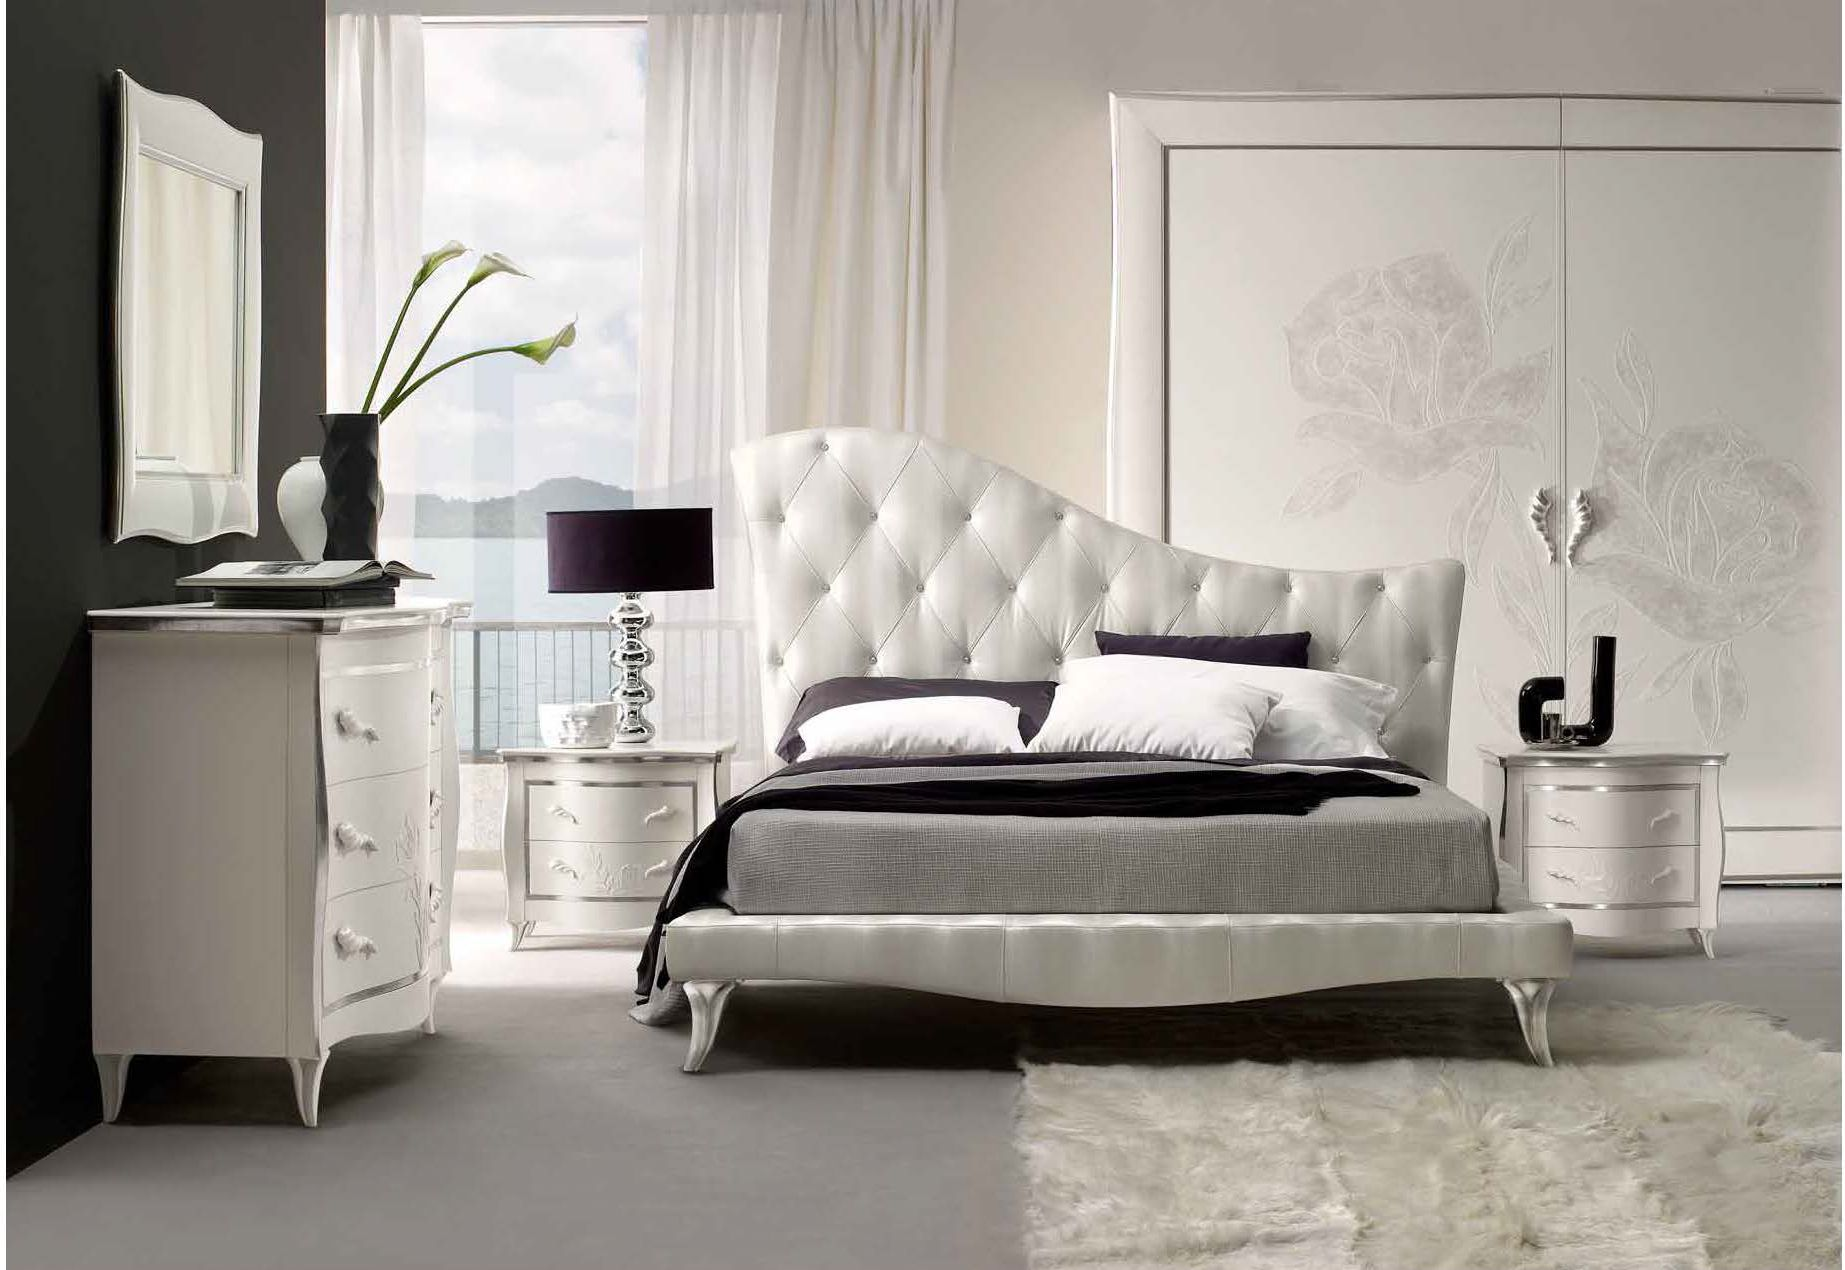 klassische m bel schlafzimmer ferretti ferretti. Black Bedroom Furniture Sets. Home Design Ideas